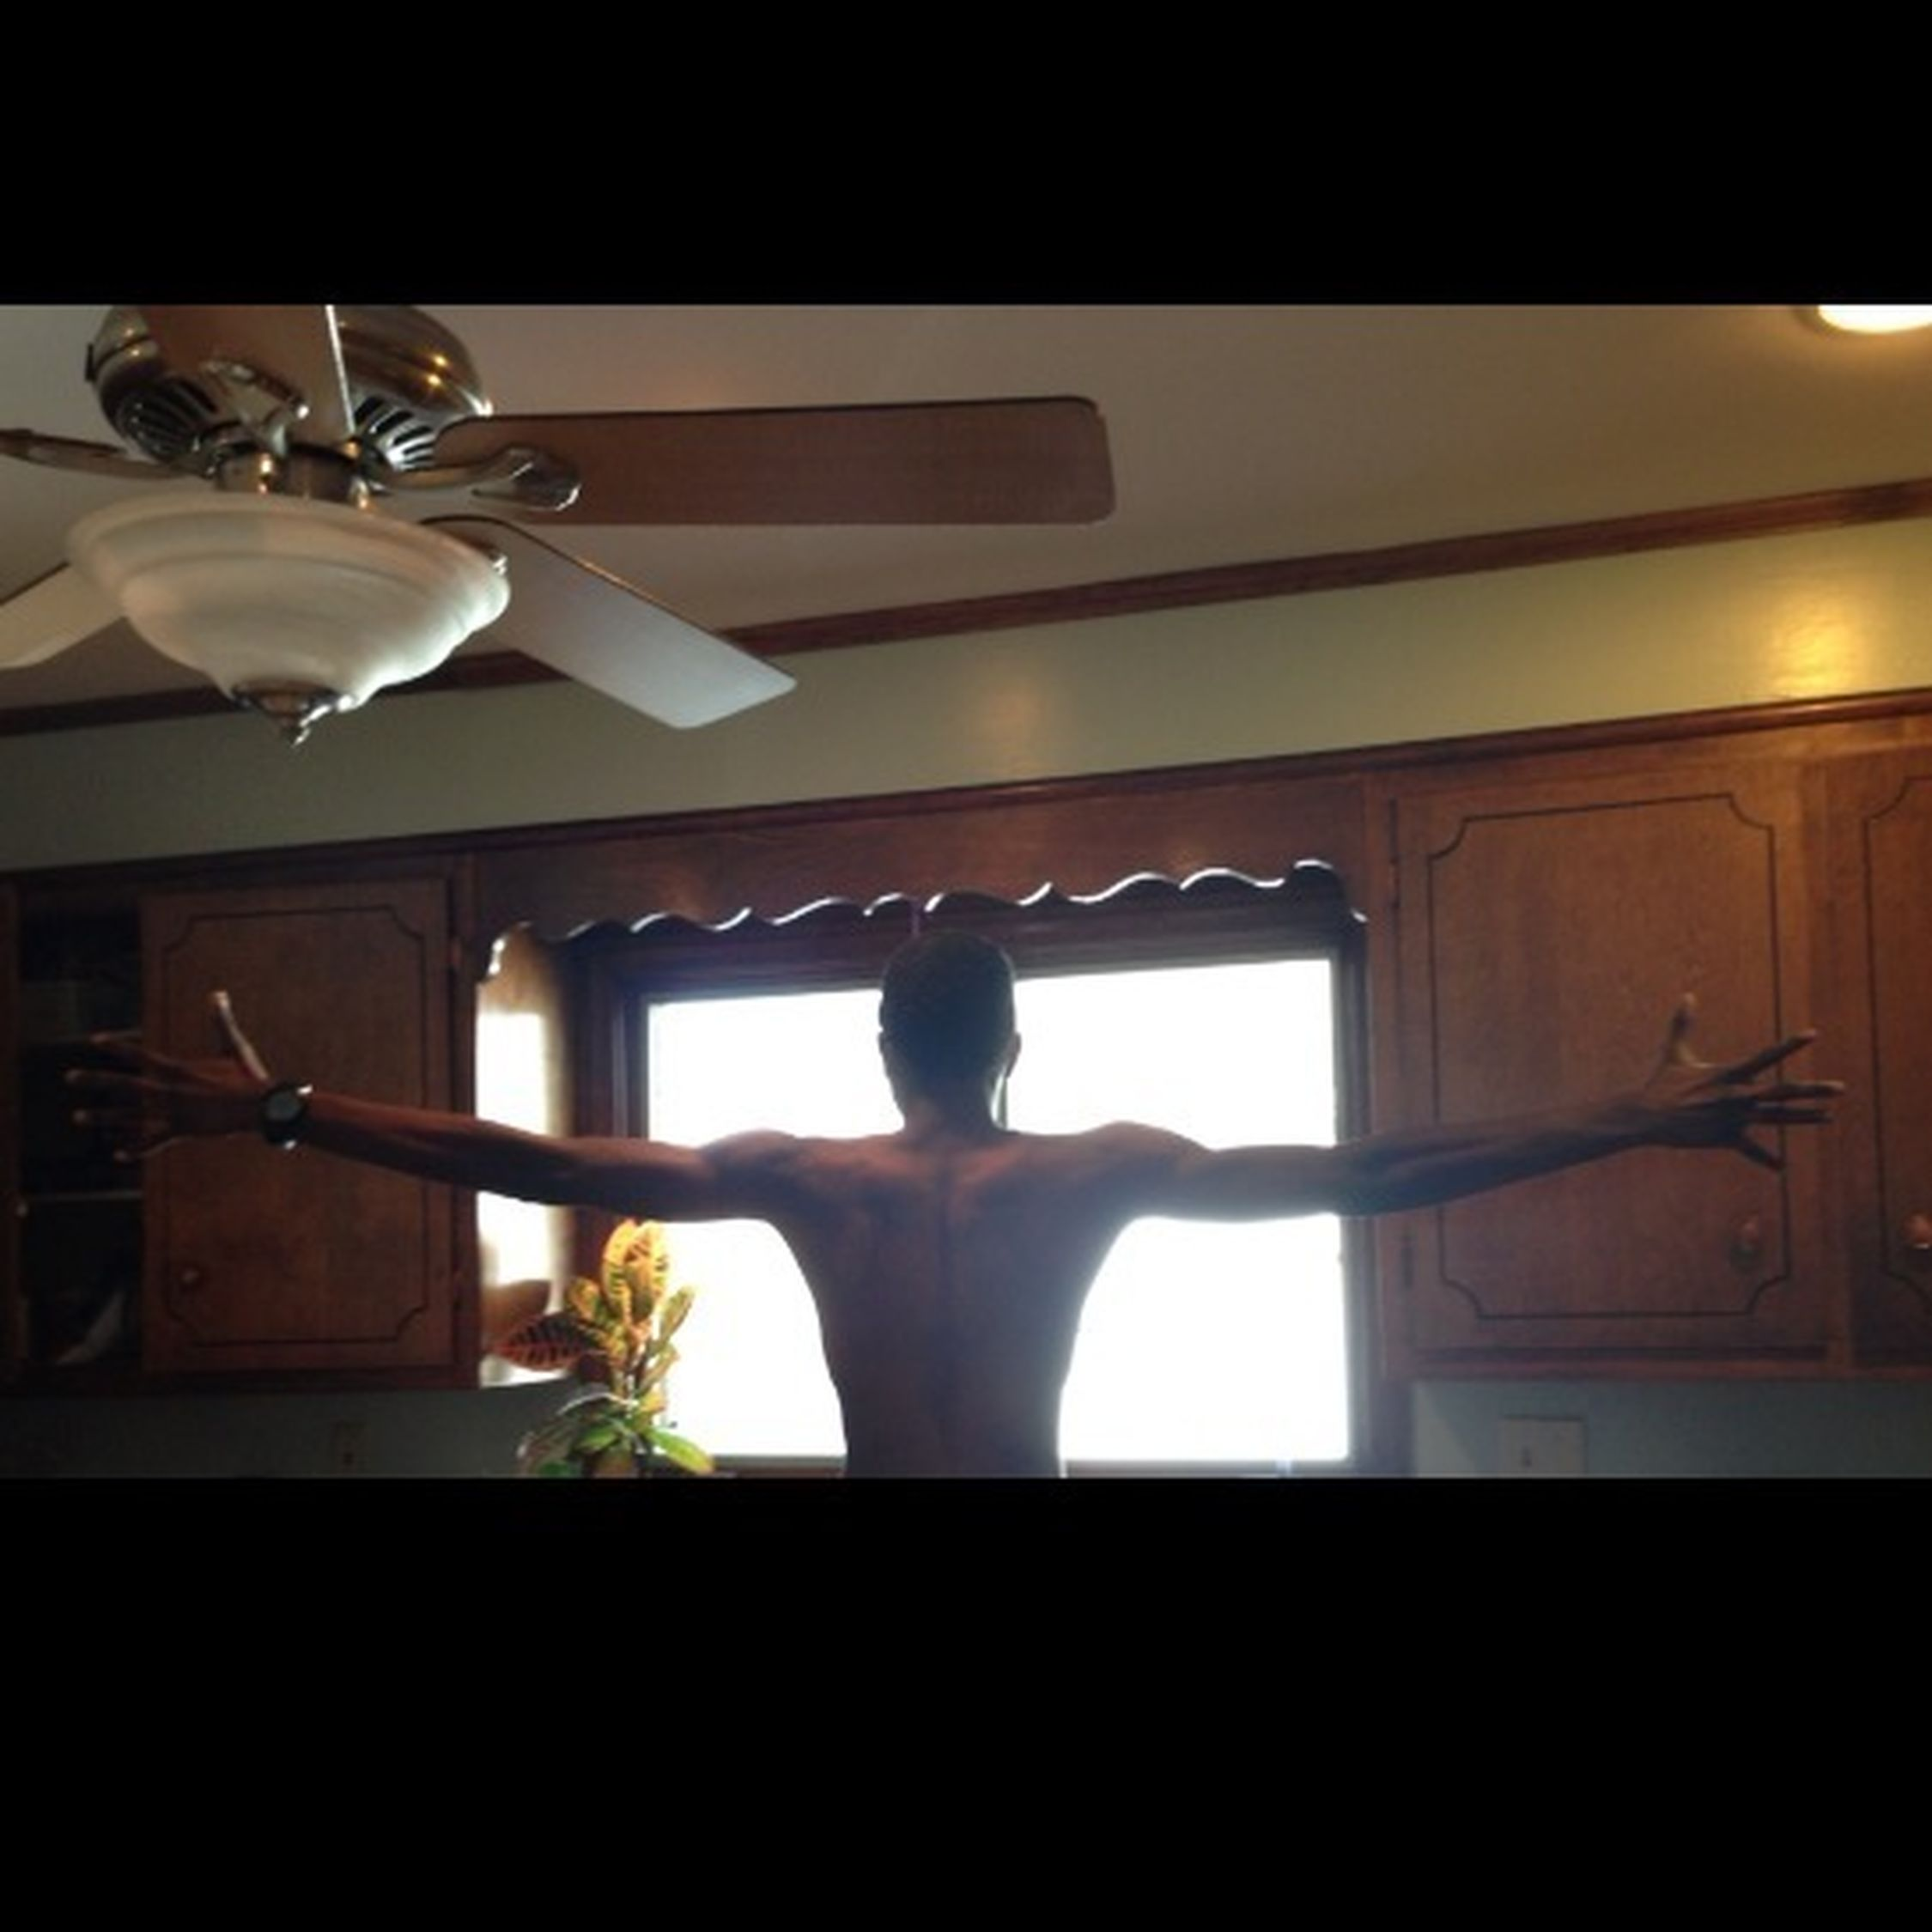 My Wingspan